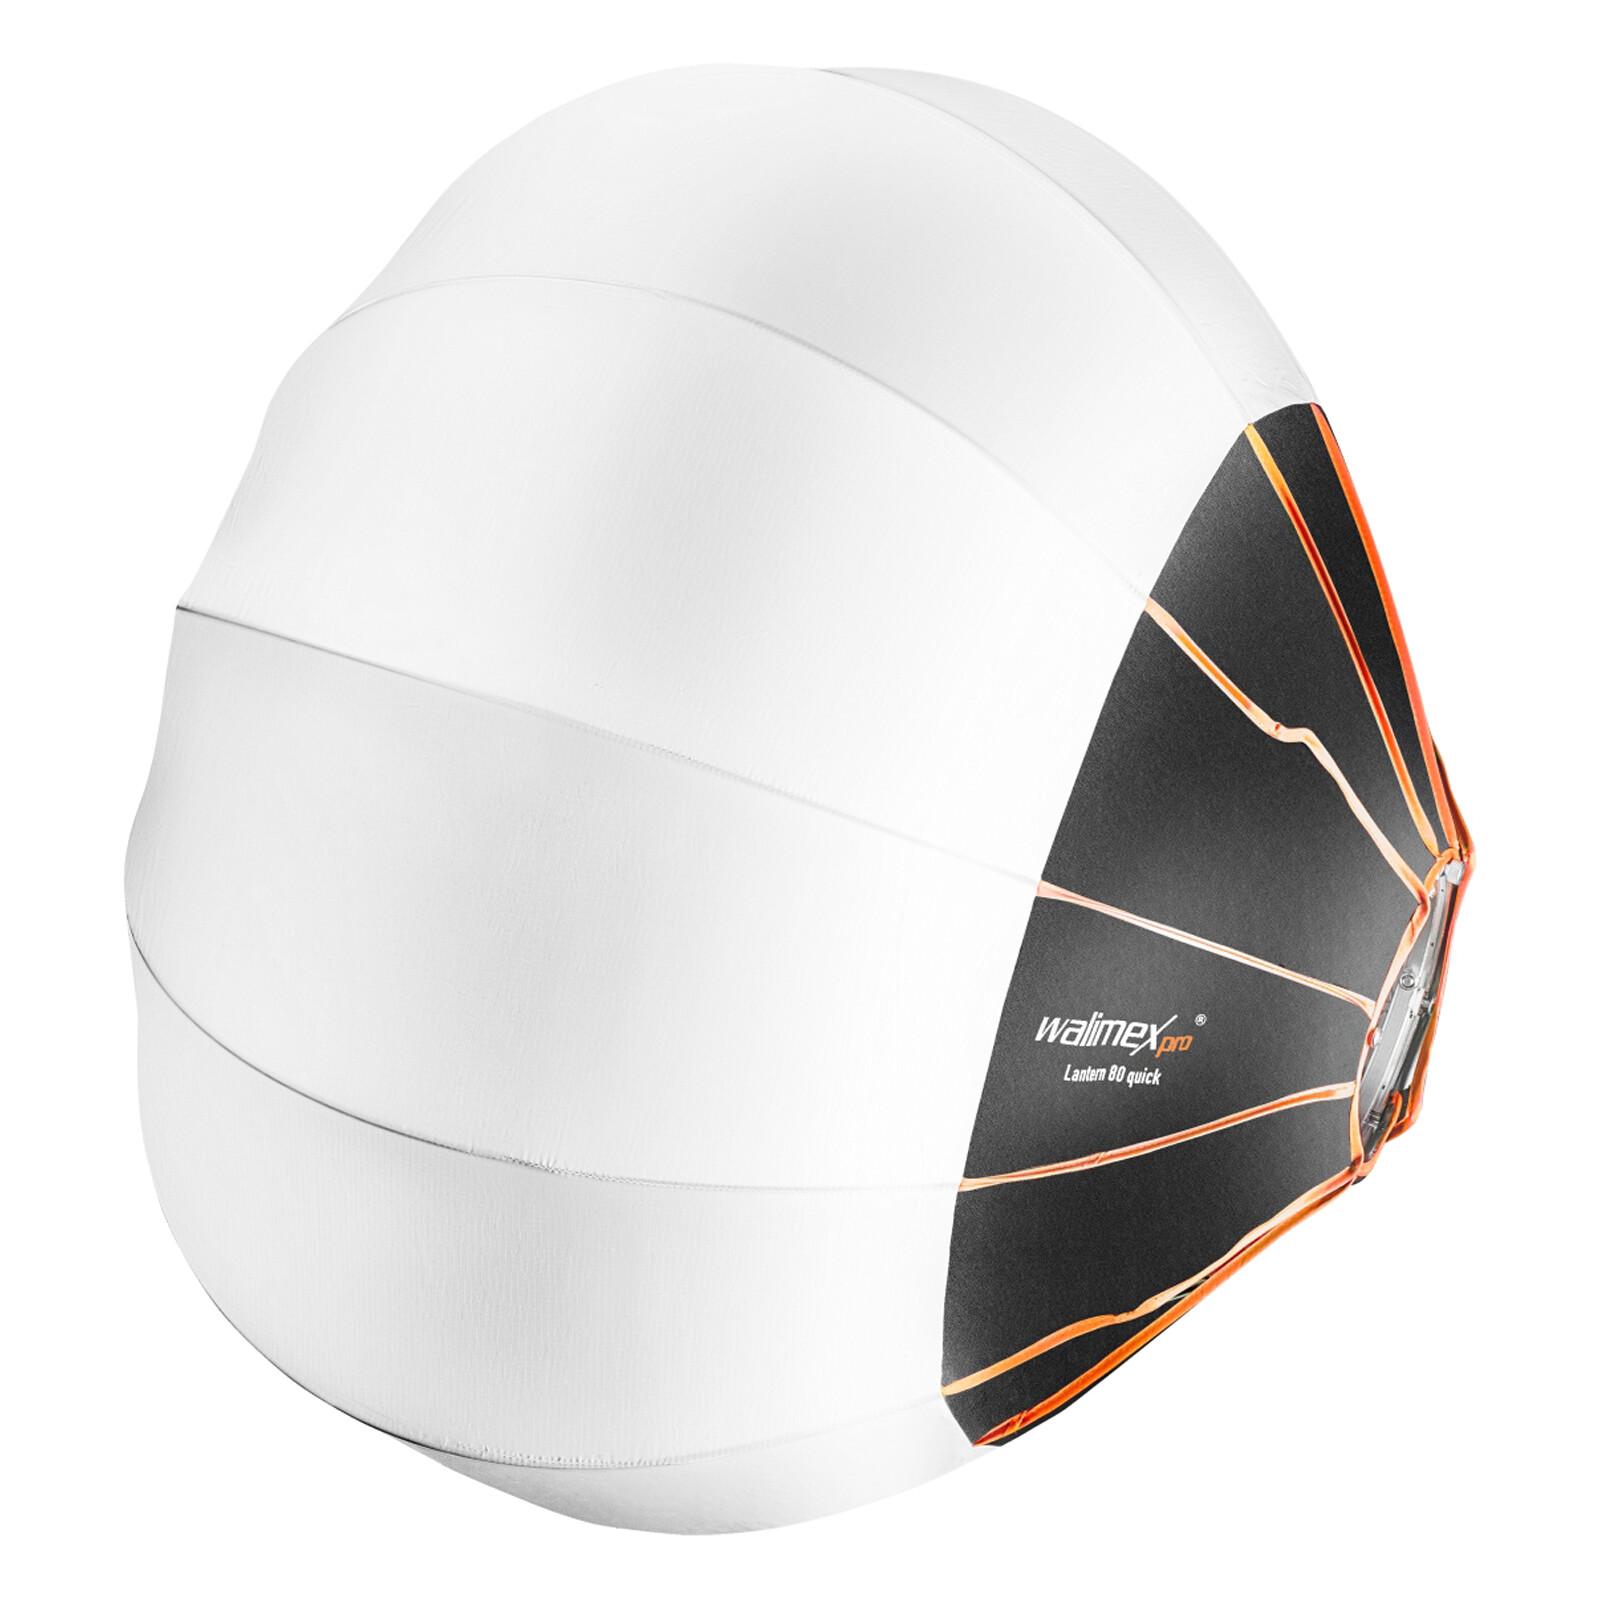 Walimex pro 360° Ambient Light Softbox 80cm Visatec